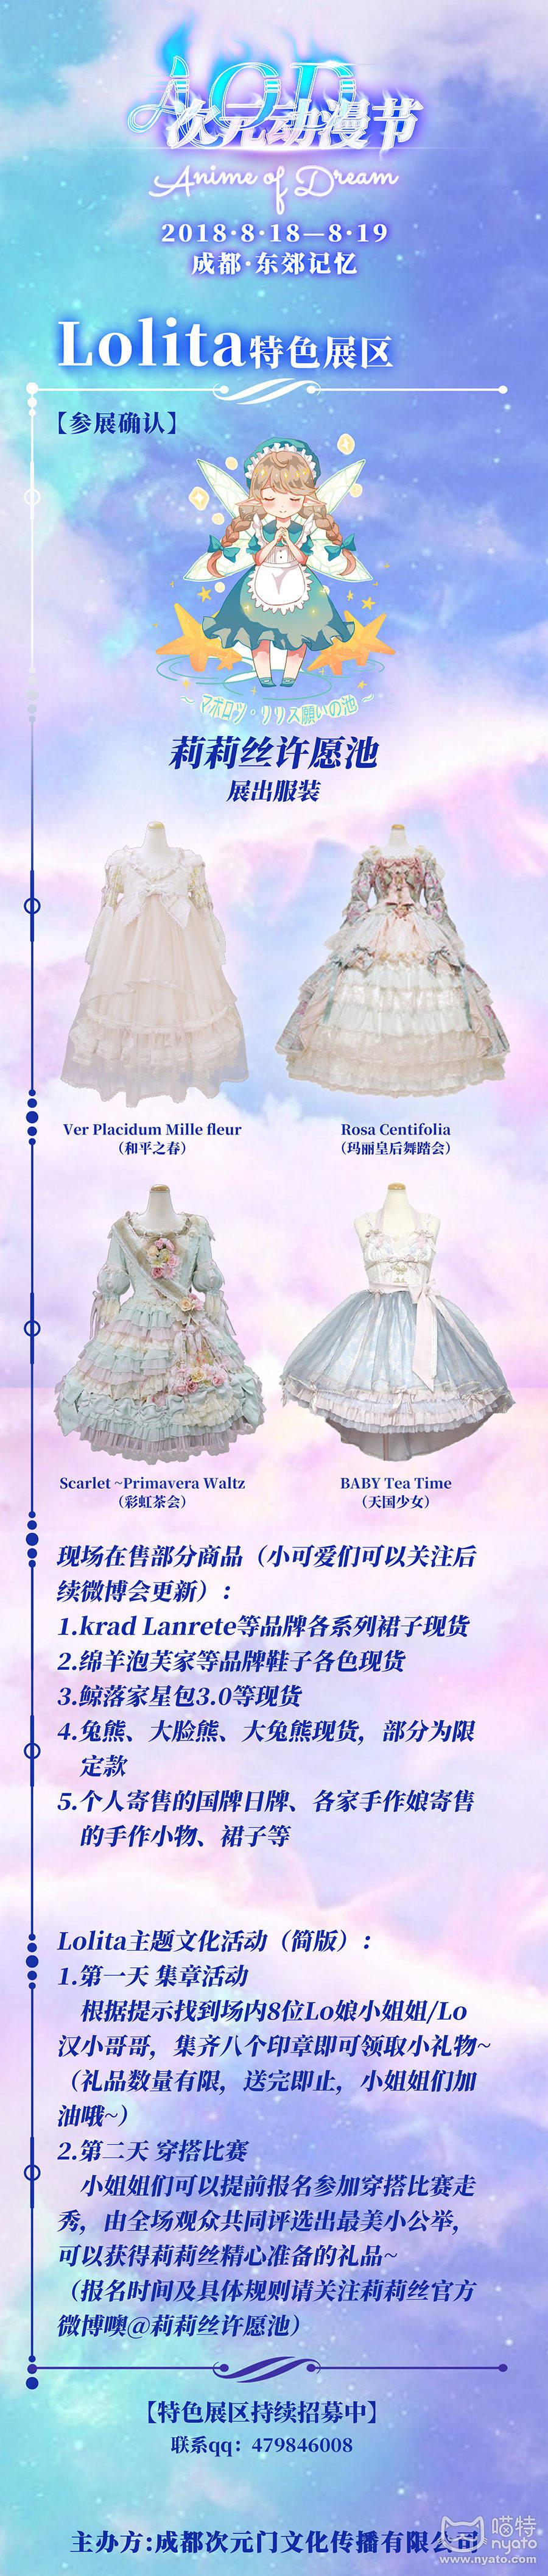 4lolita专区莉莉丝.jpg